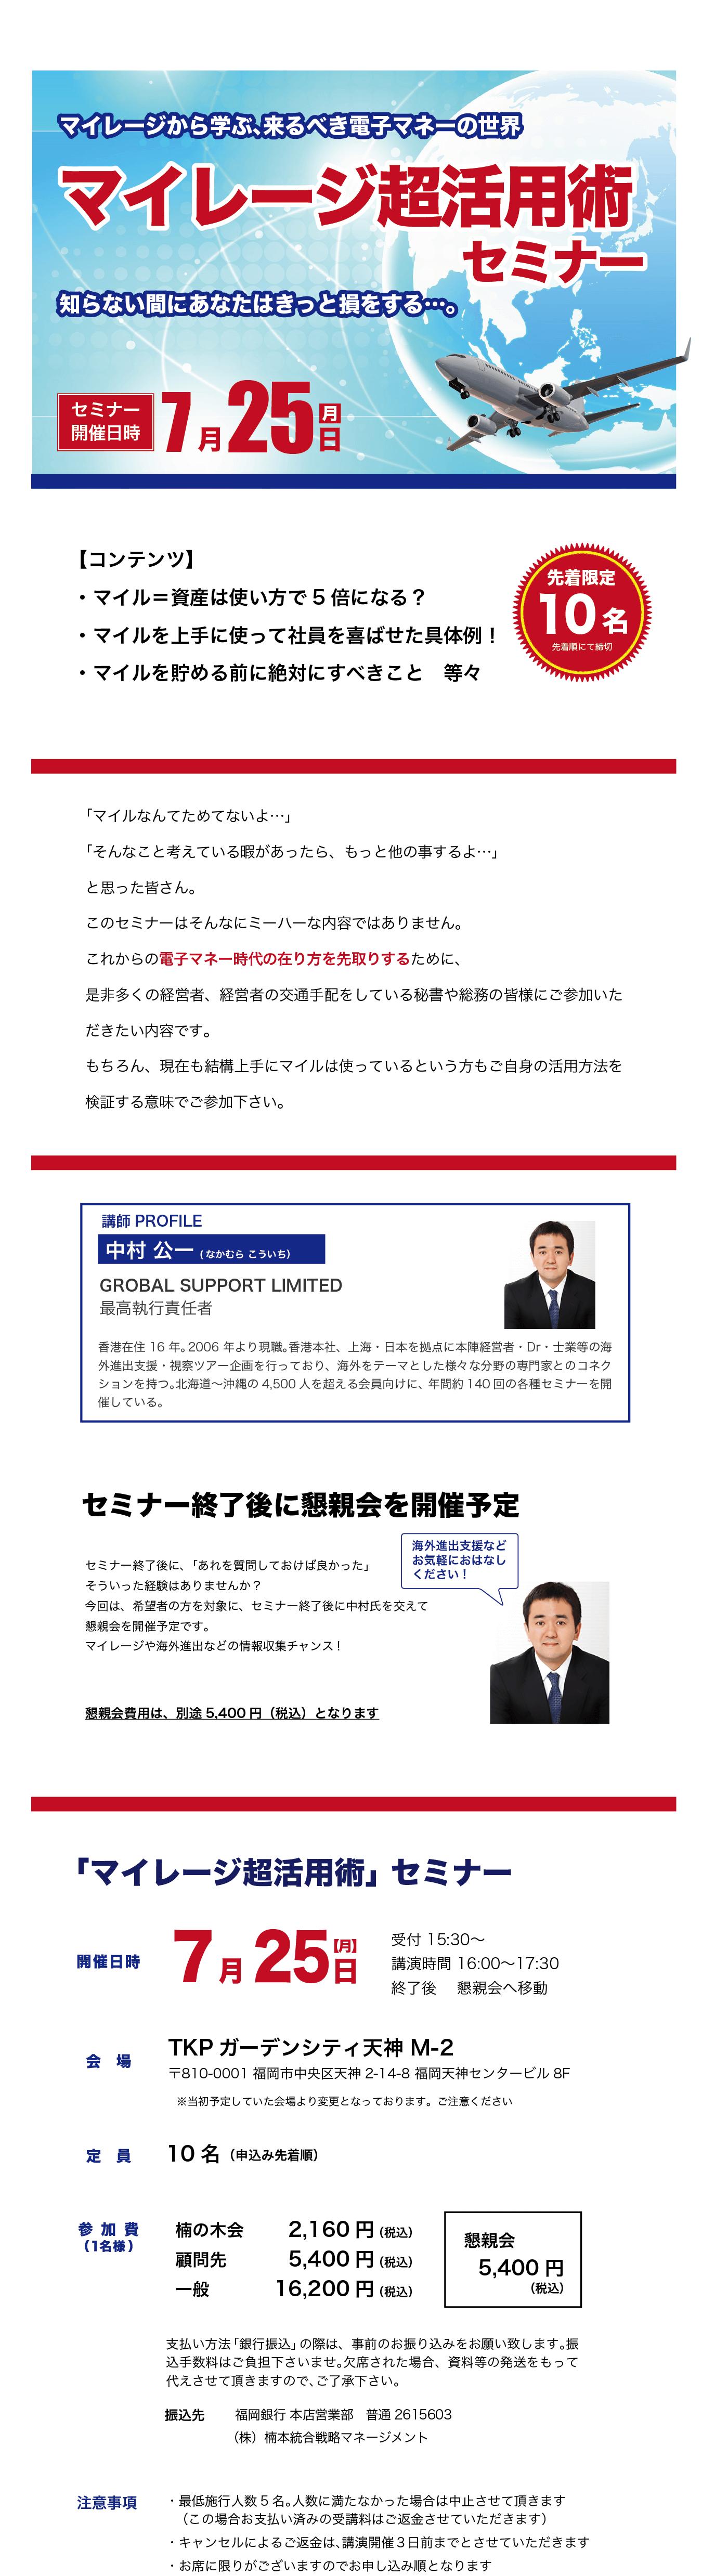 seminar_201607_4